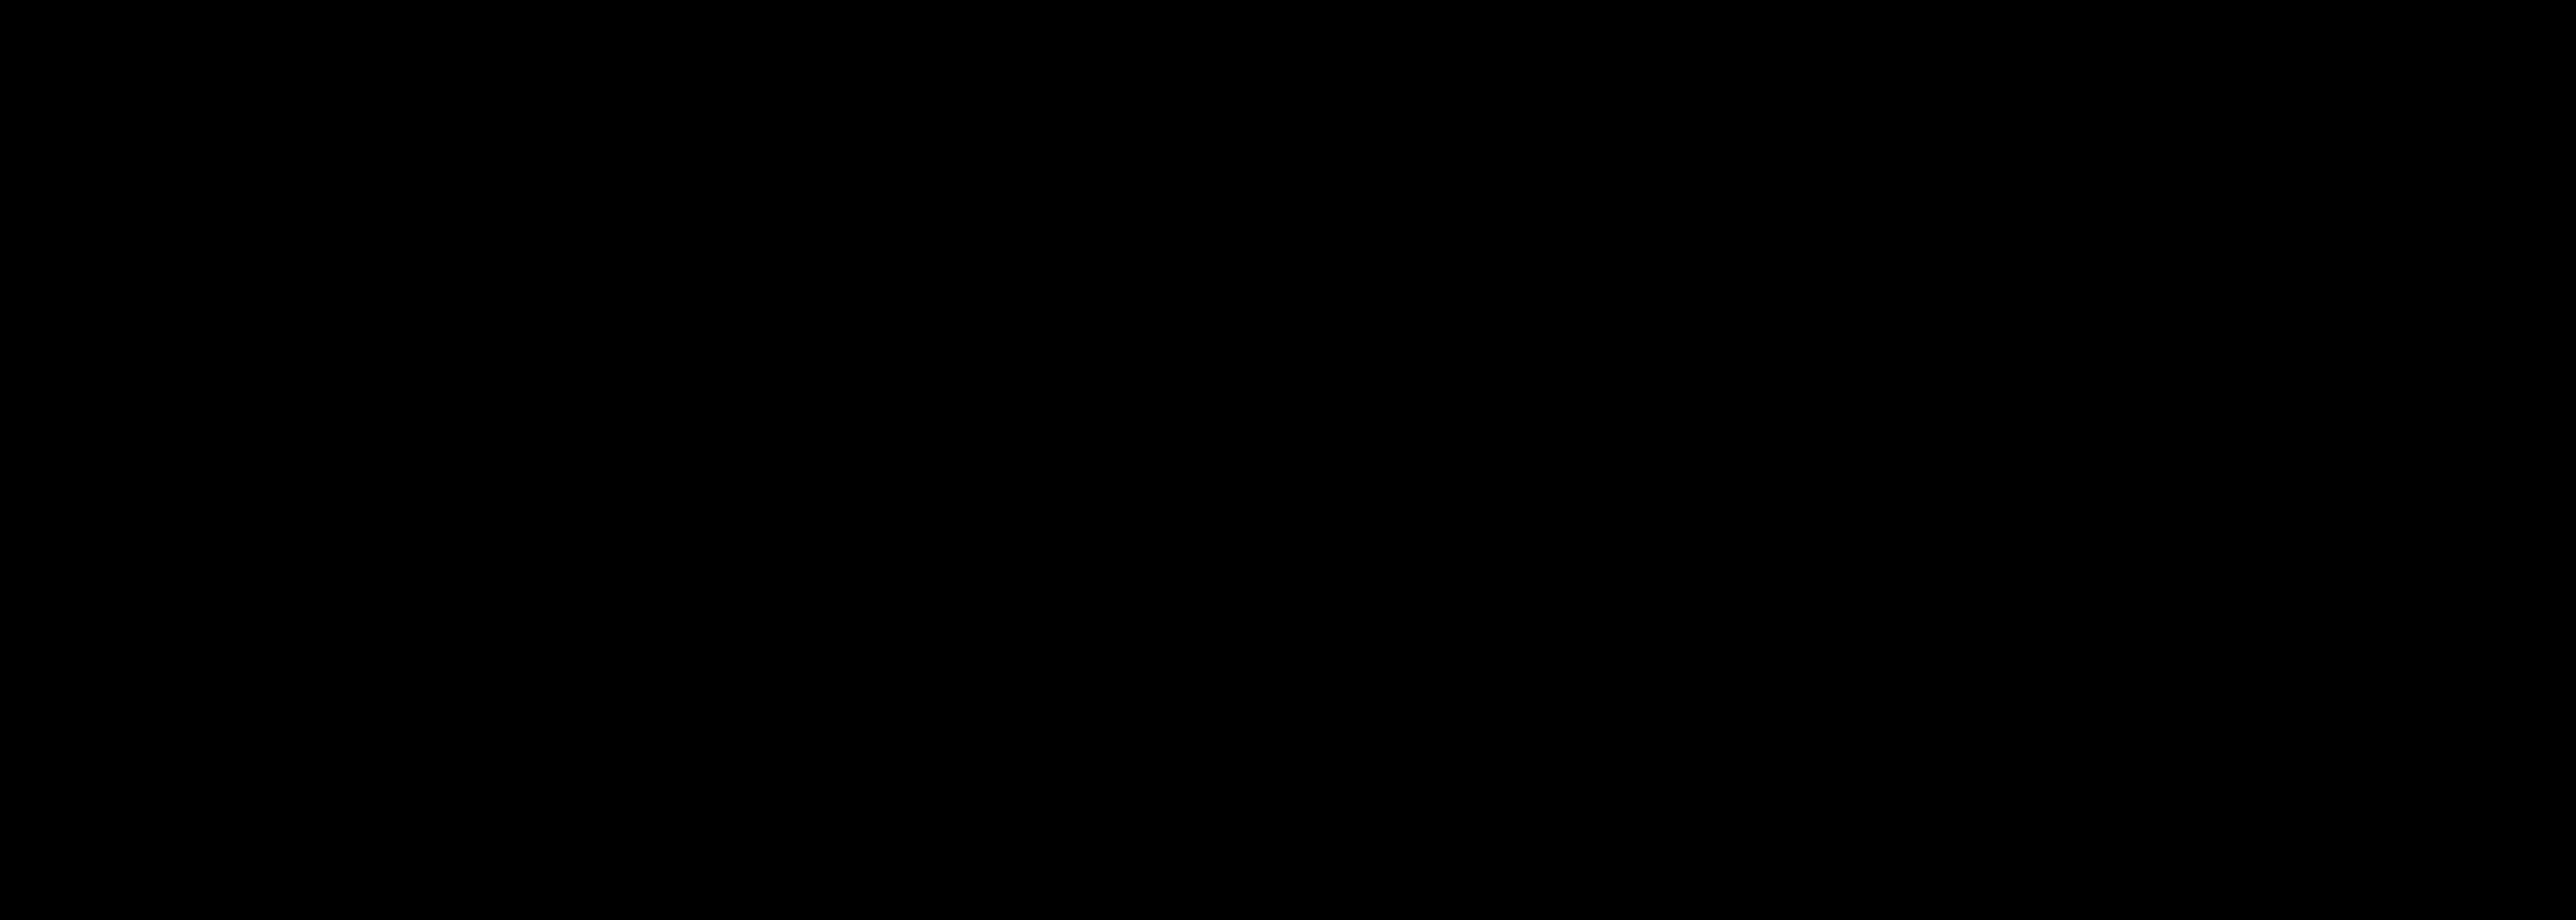 Black logo - no background